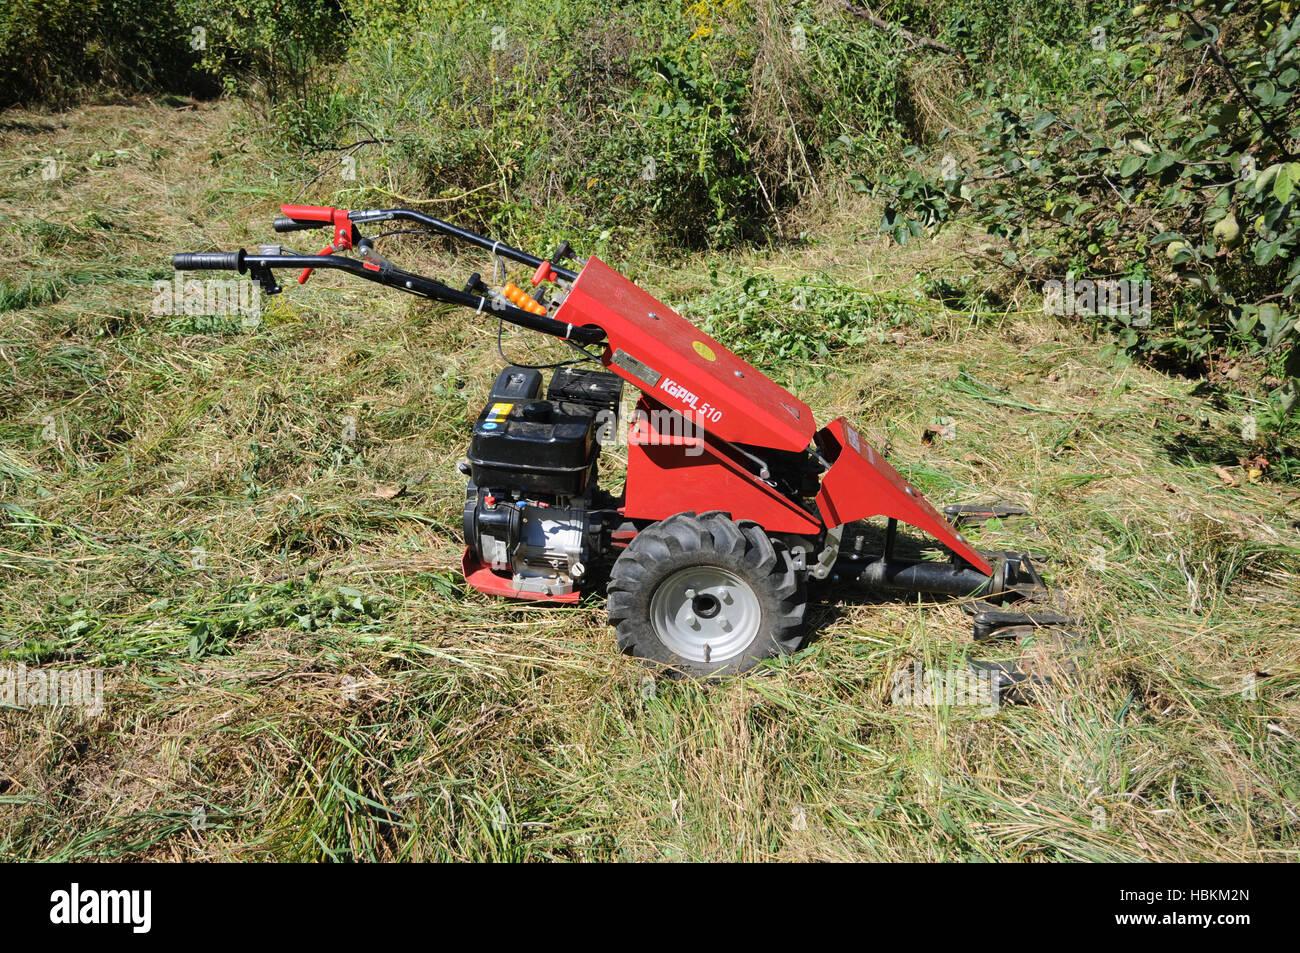 sickle bar mower - Stock Image